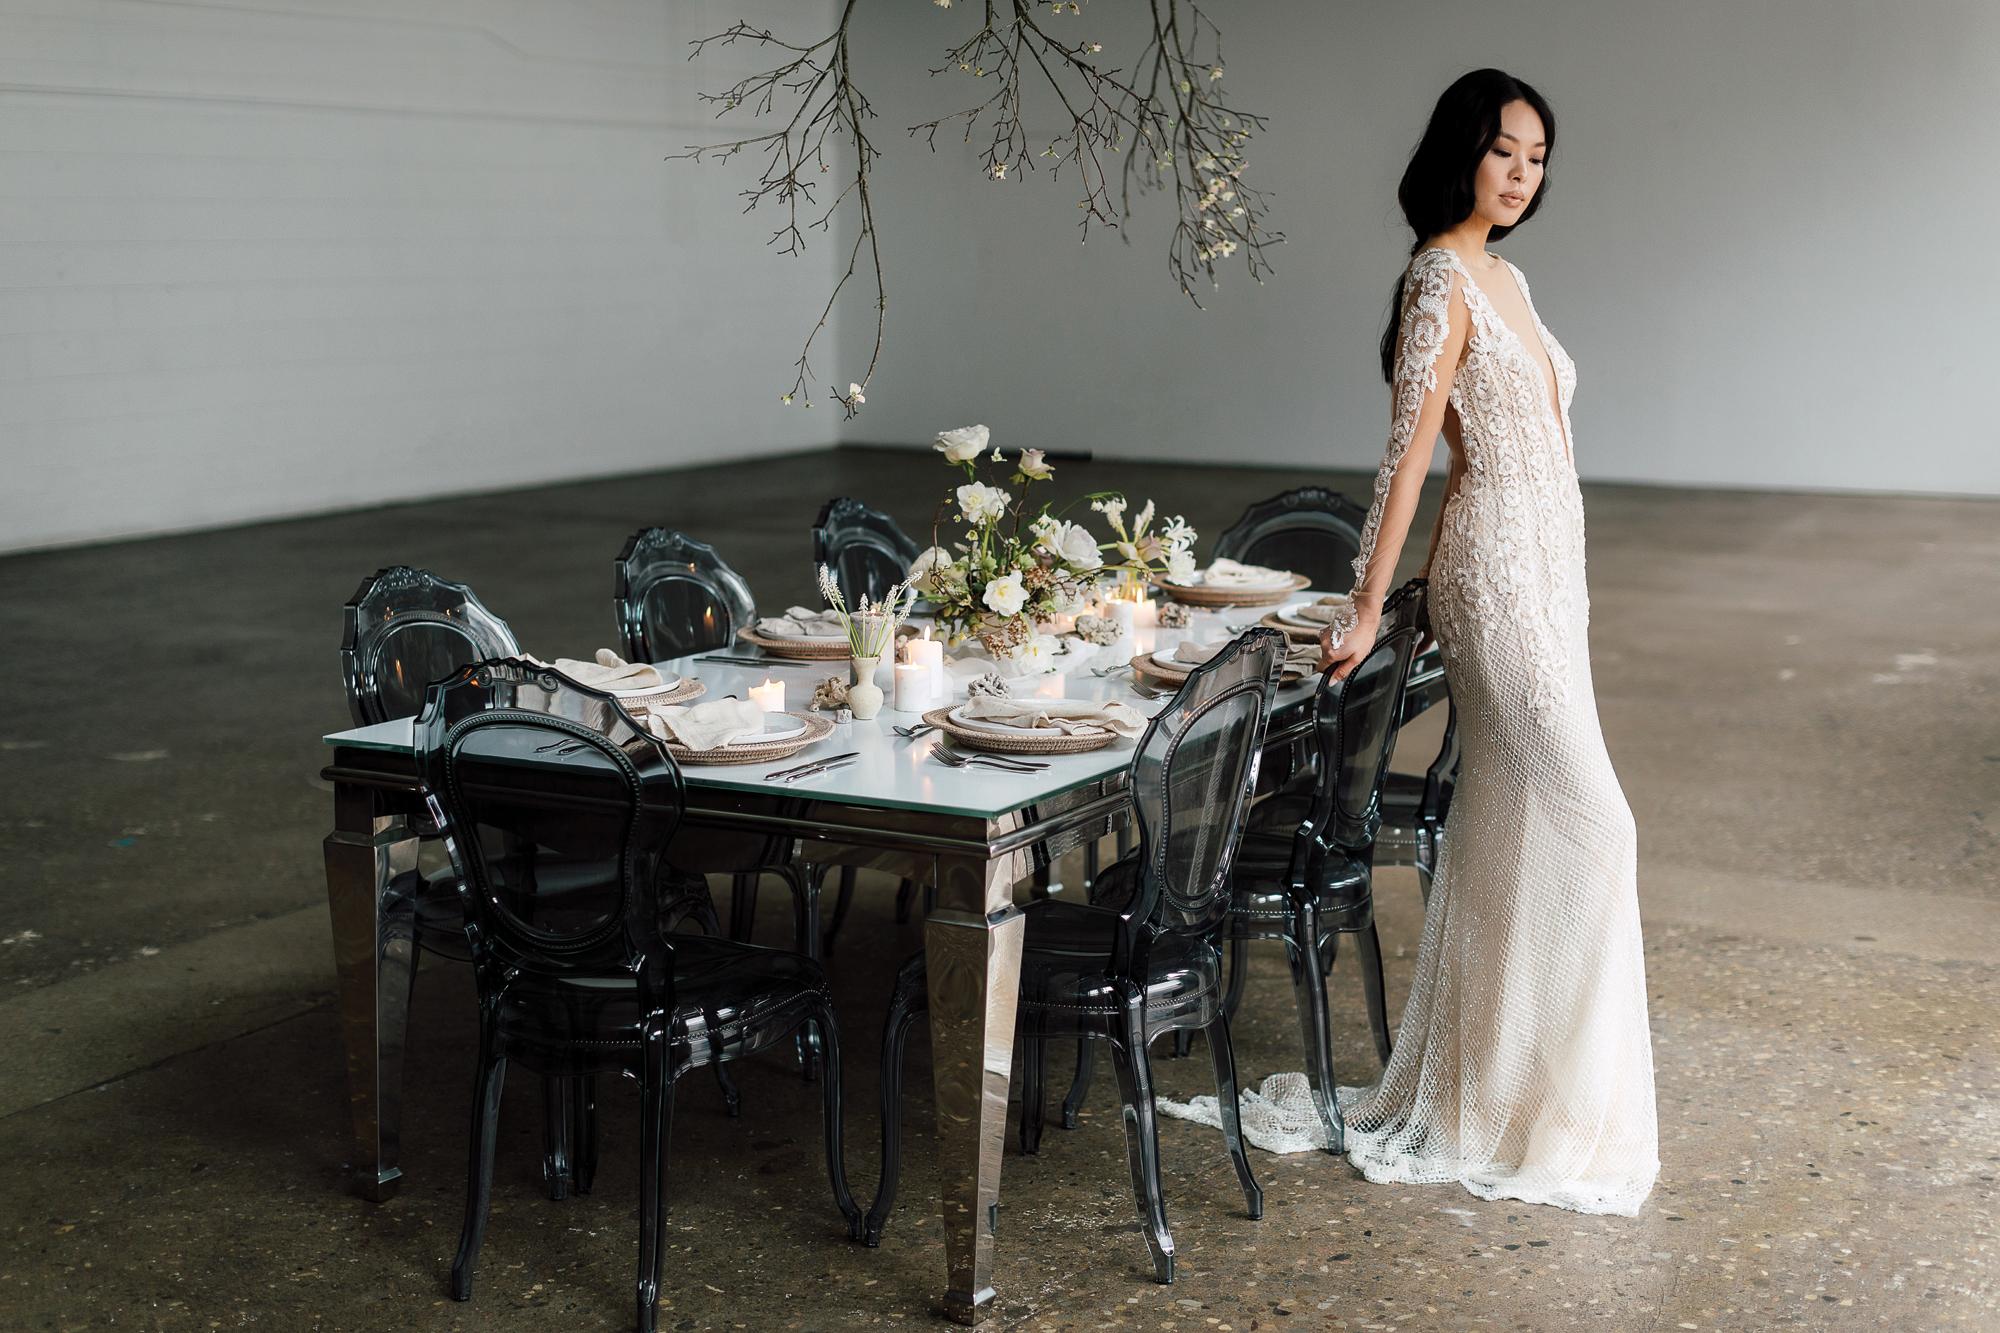 Wedding_venue_styling_global_trends_1.jpg